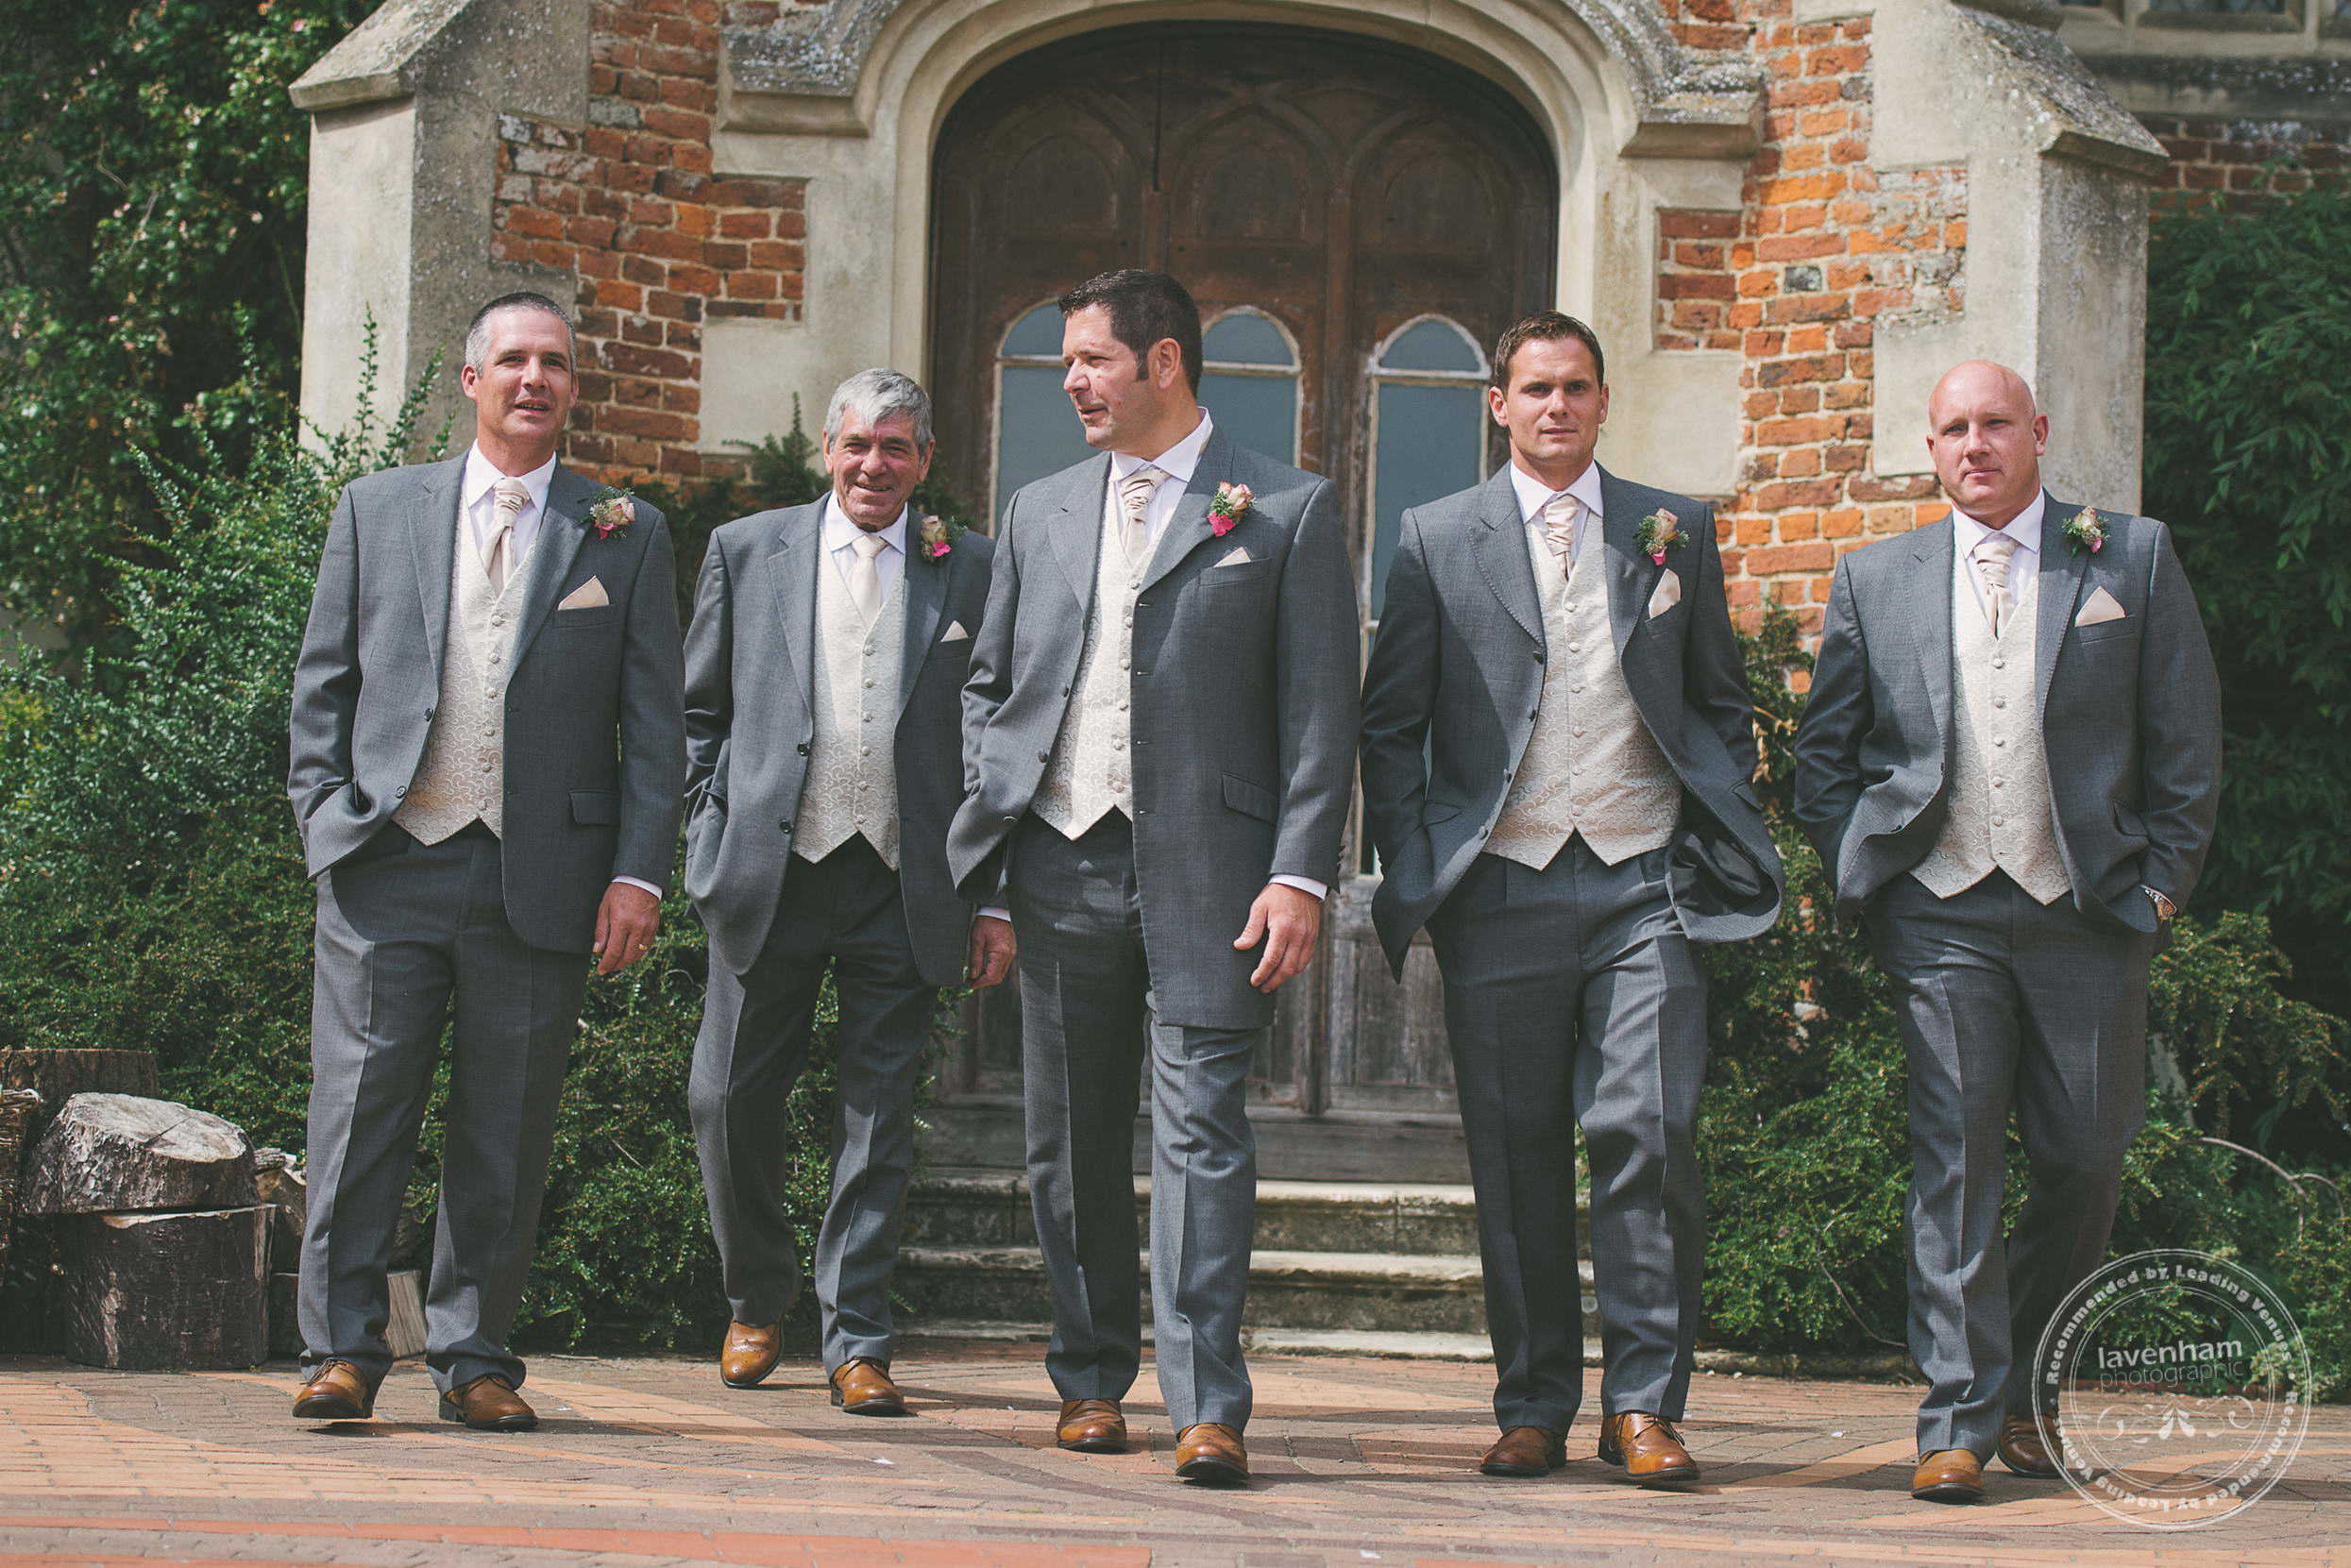 180715-kentwell-hall-wedding-photographer-011